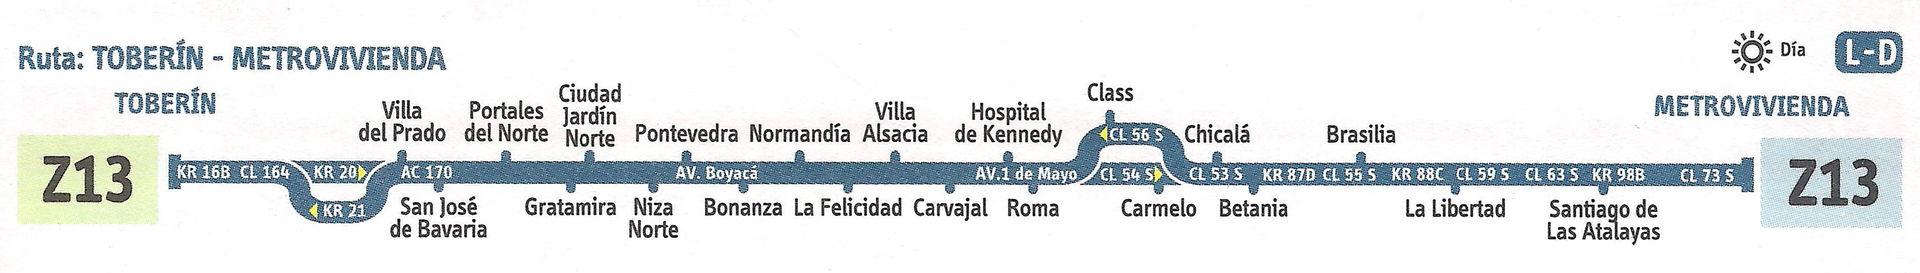 Ruta SITP: Z13 Toberín ↔ Metrovivienda [Urbana] 4